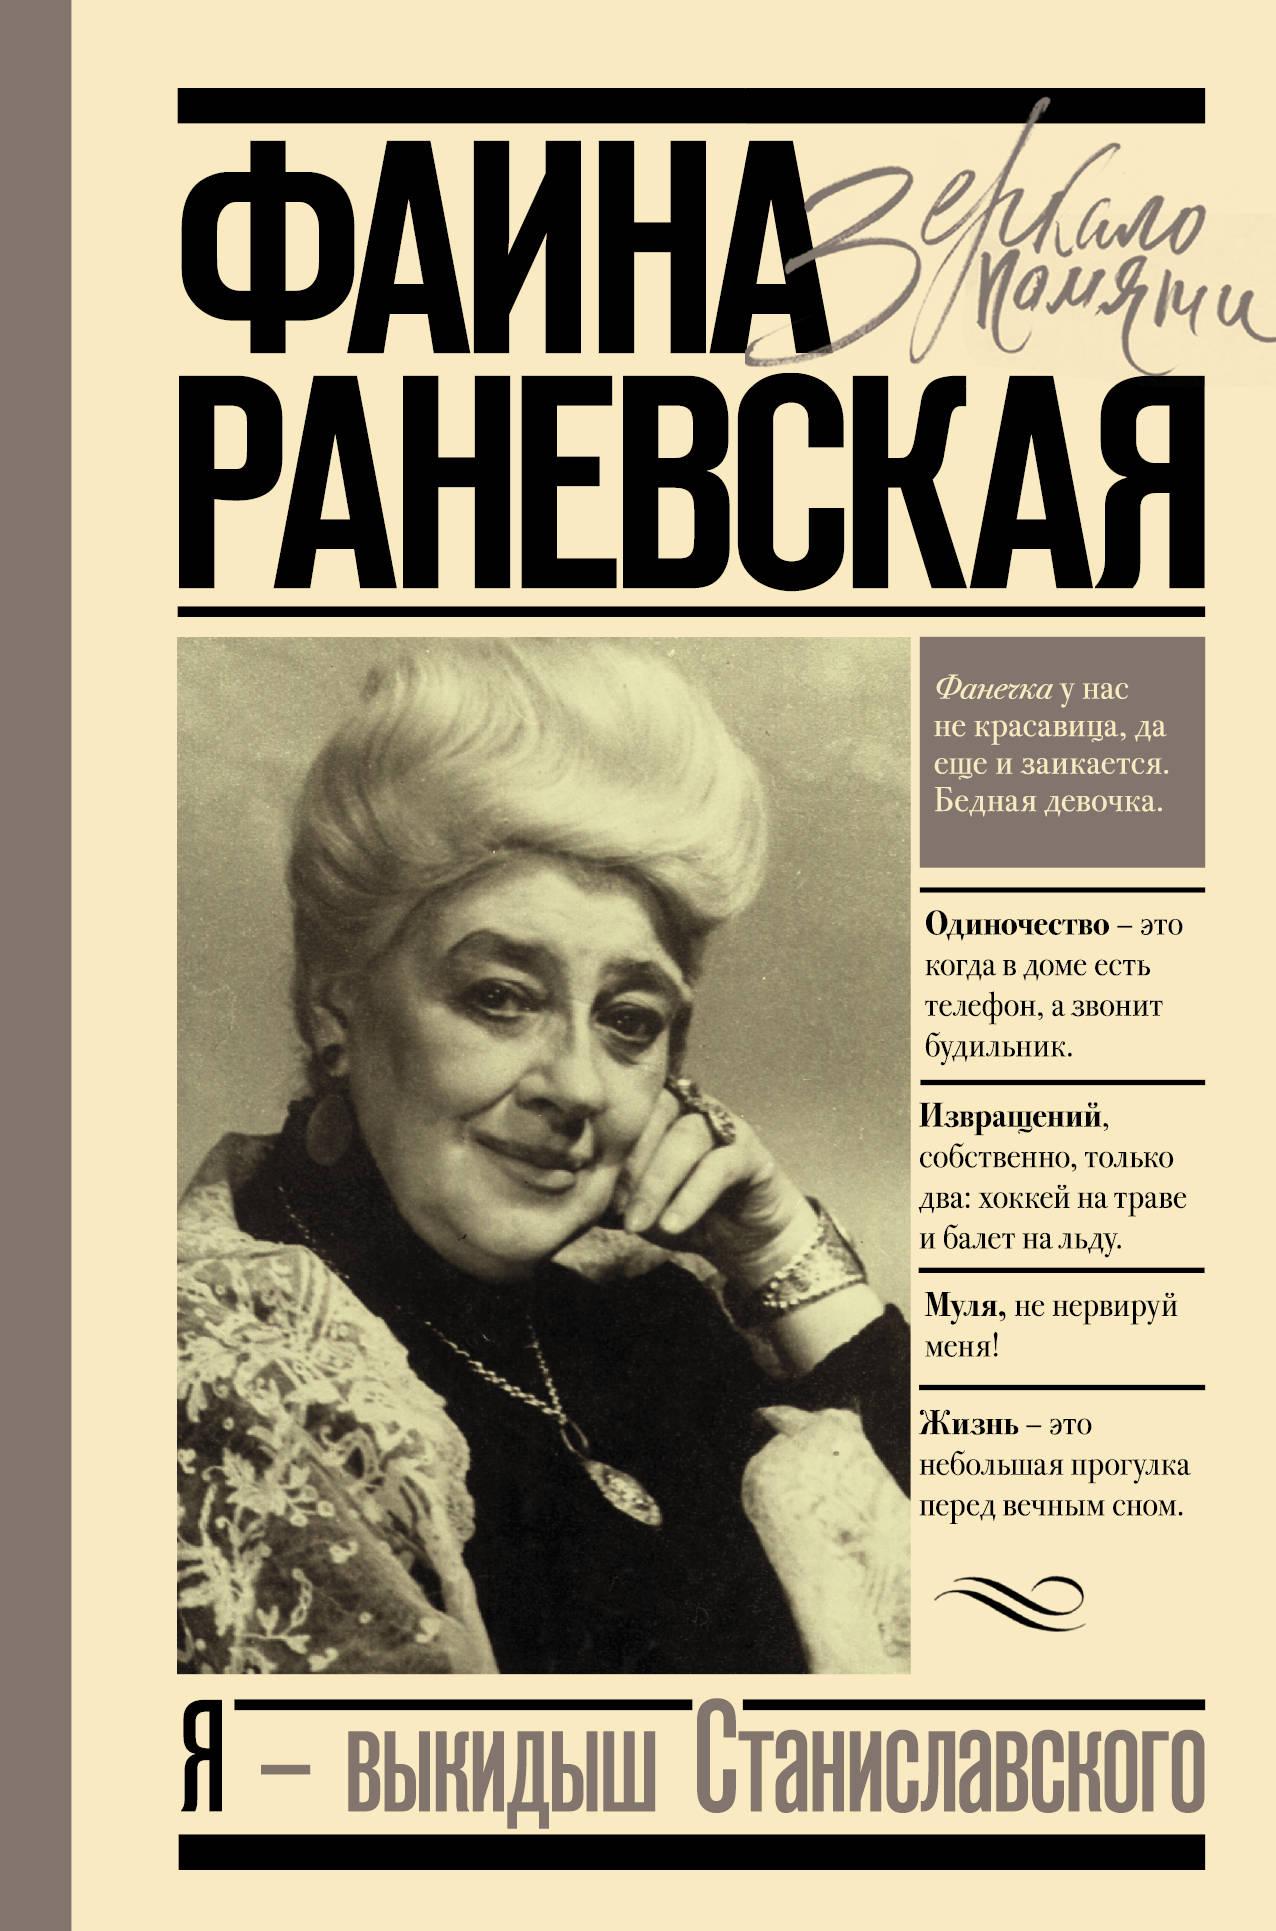 Ja - vykidysh Stanislavskogo